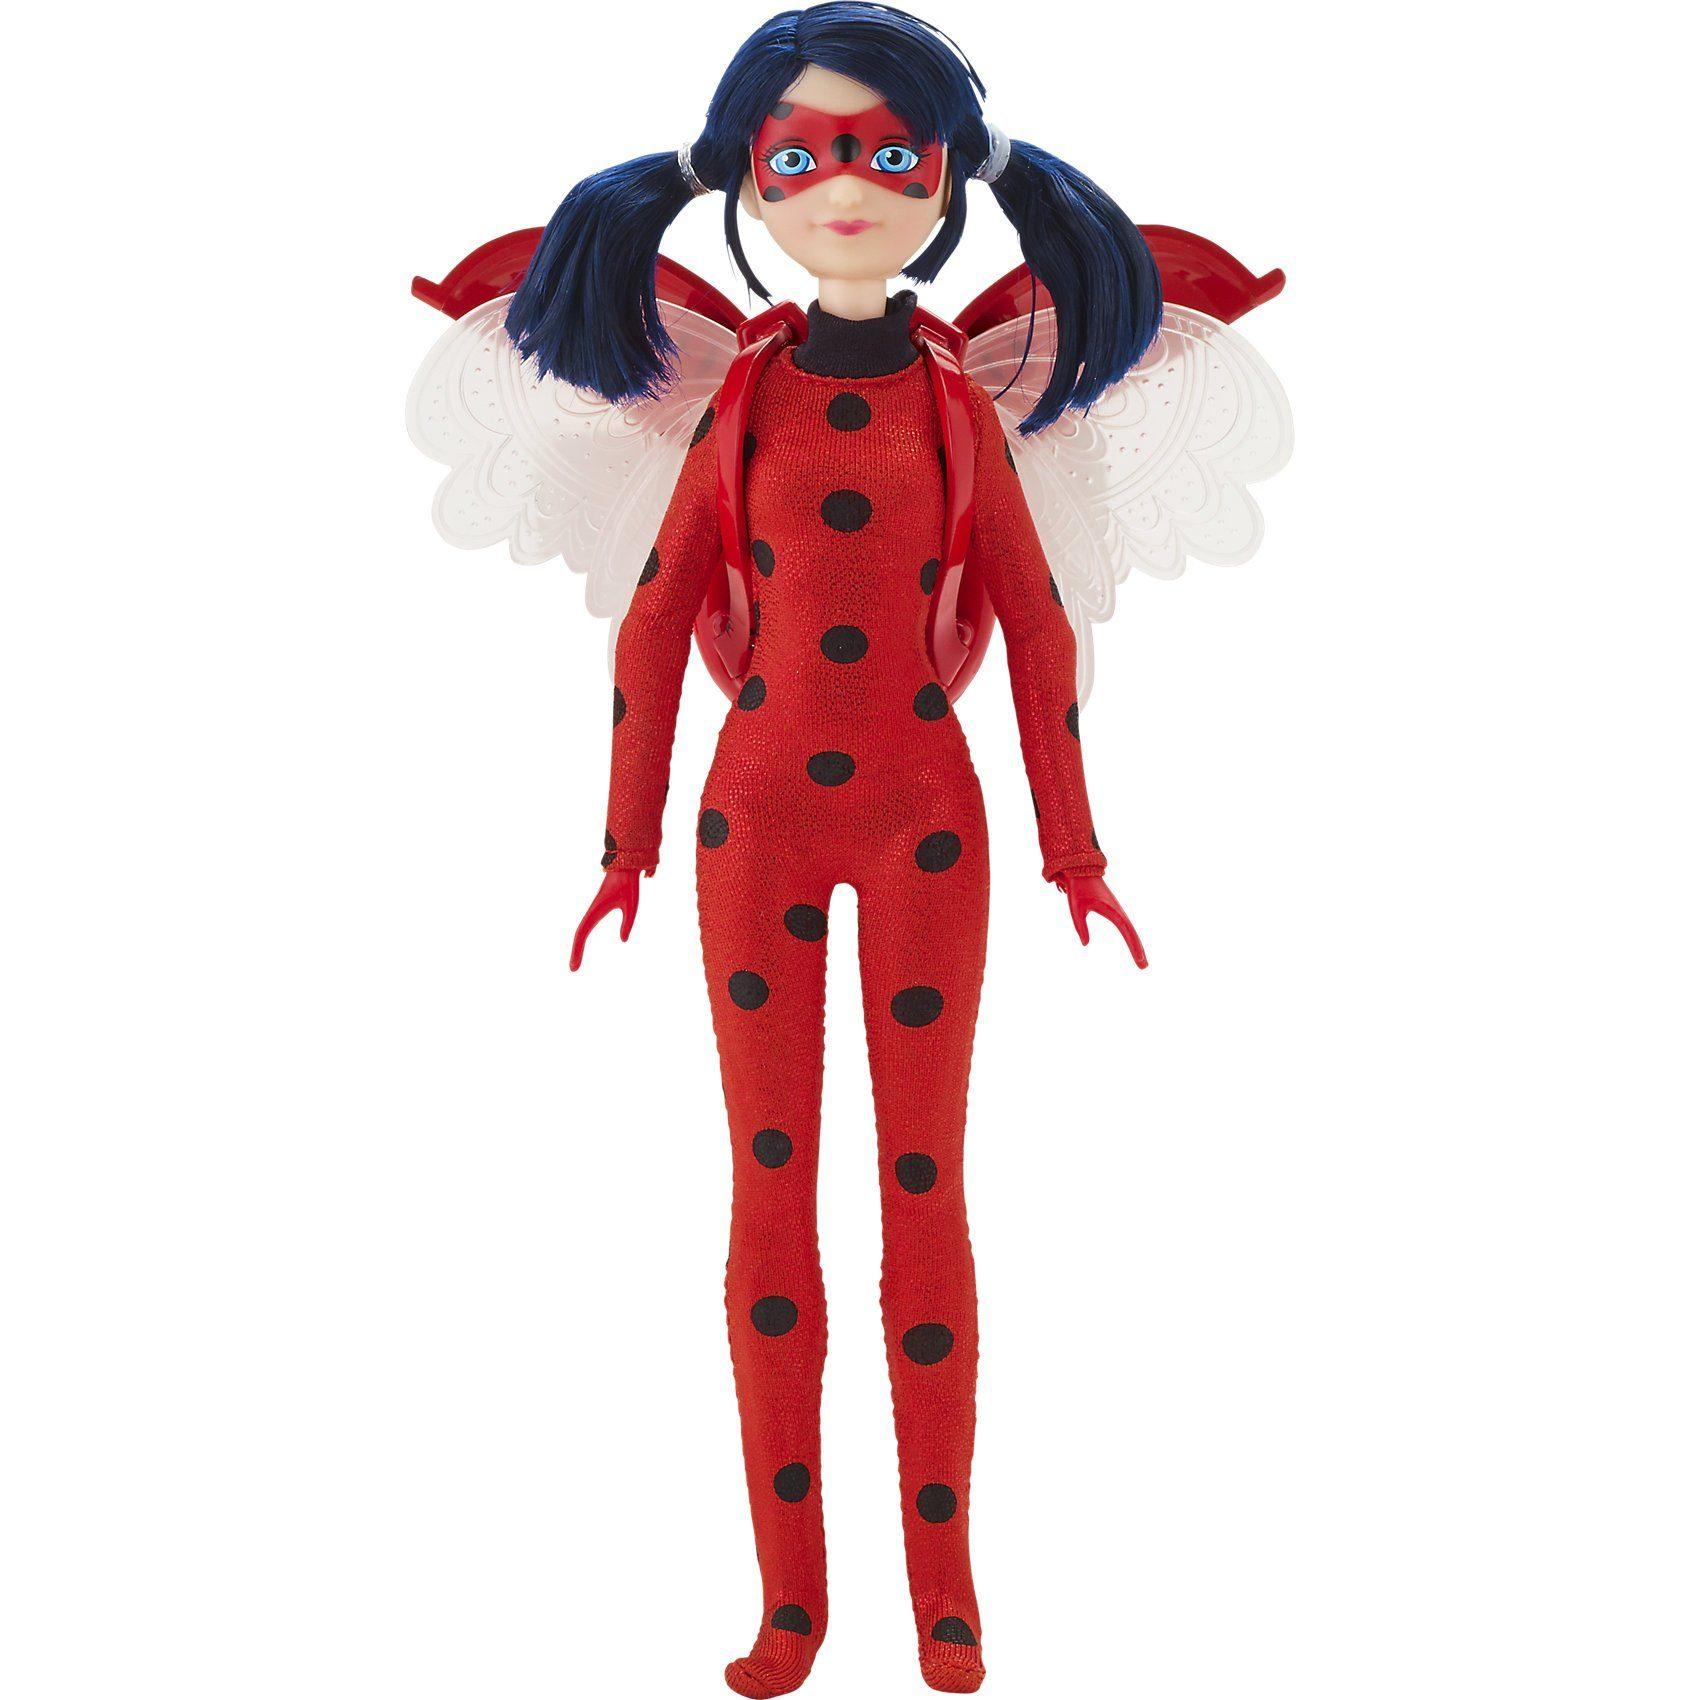 Bandai Miraculous Aufleuchtende 26cm große Puppe